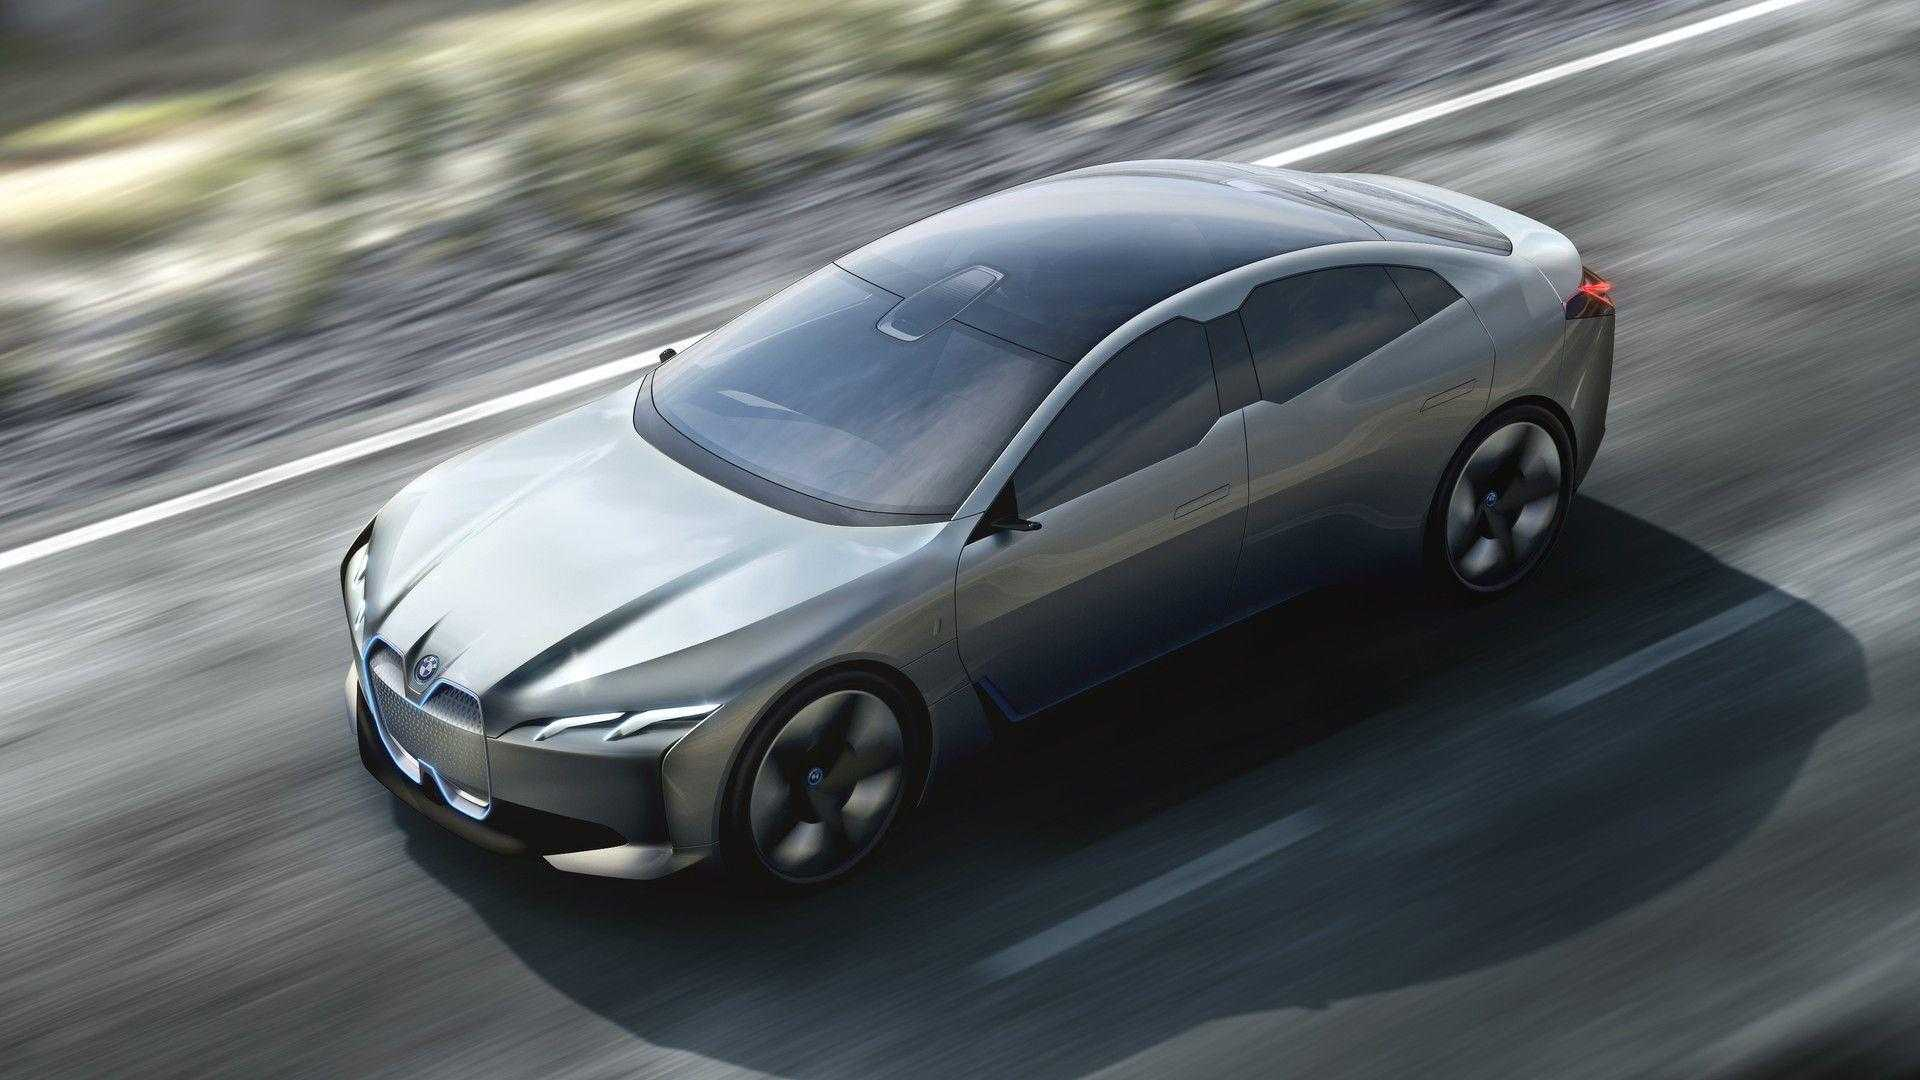 BMW Electrification Roadmap: 25 Plug-Ins By 2025